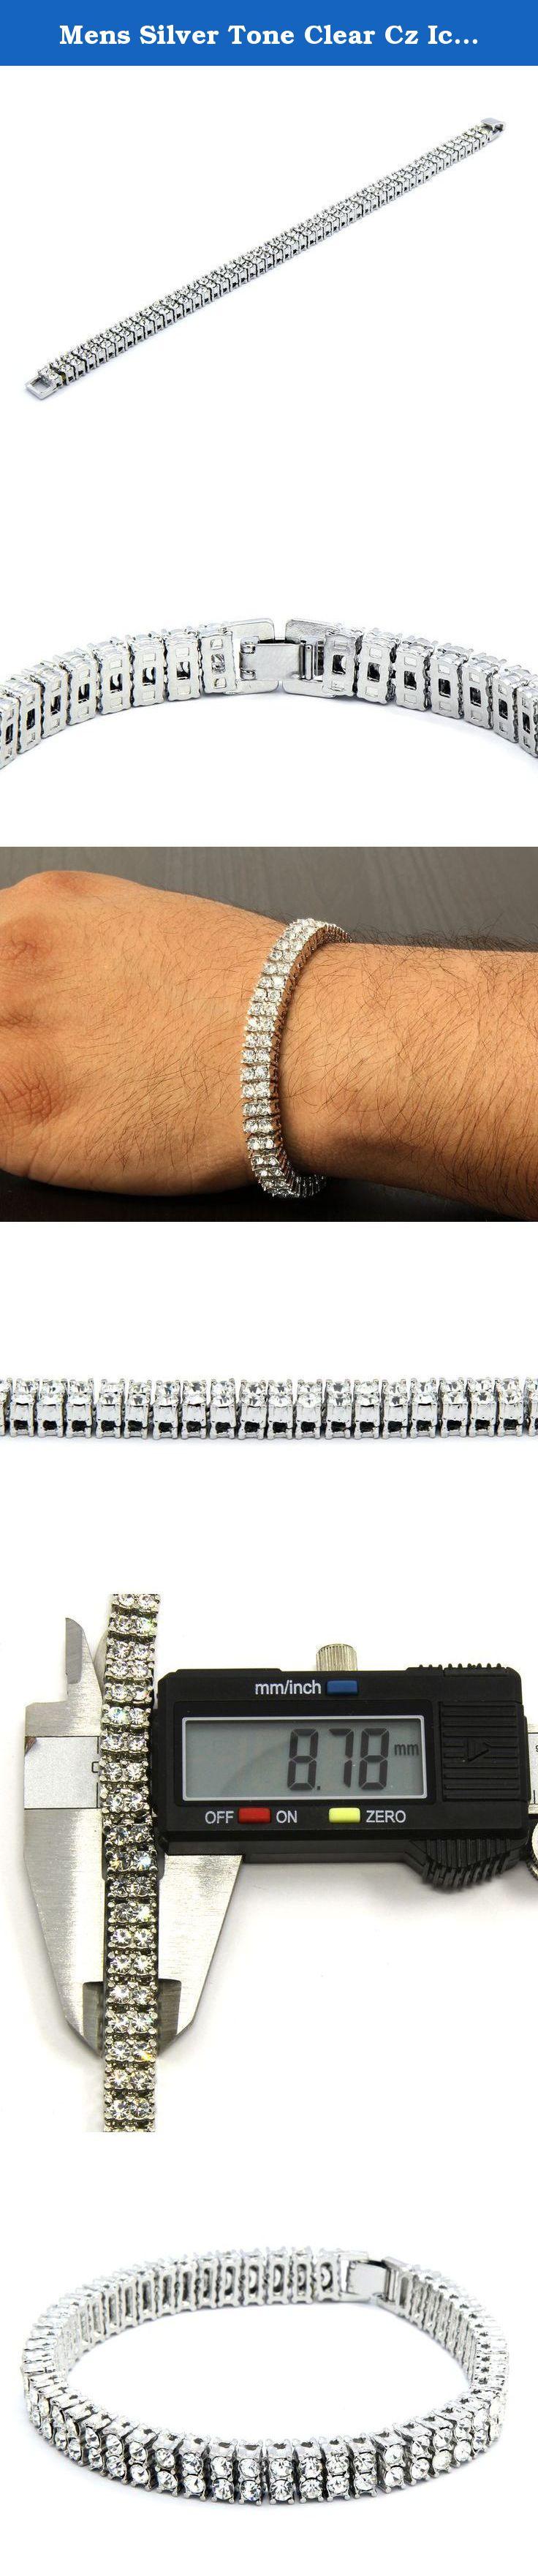 Mens silver tone clear cz iced out row hip hop bracelet